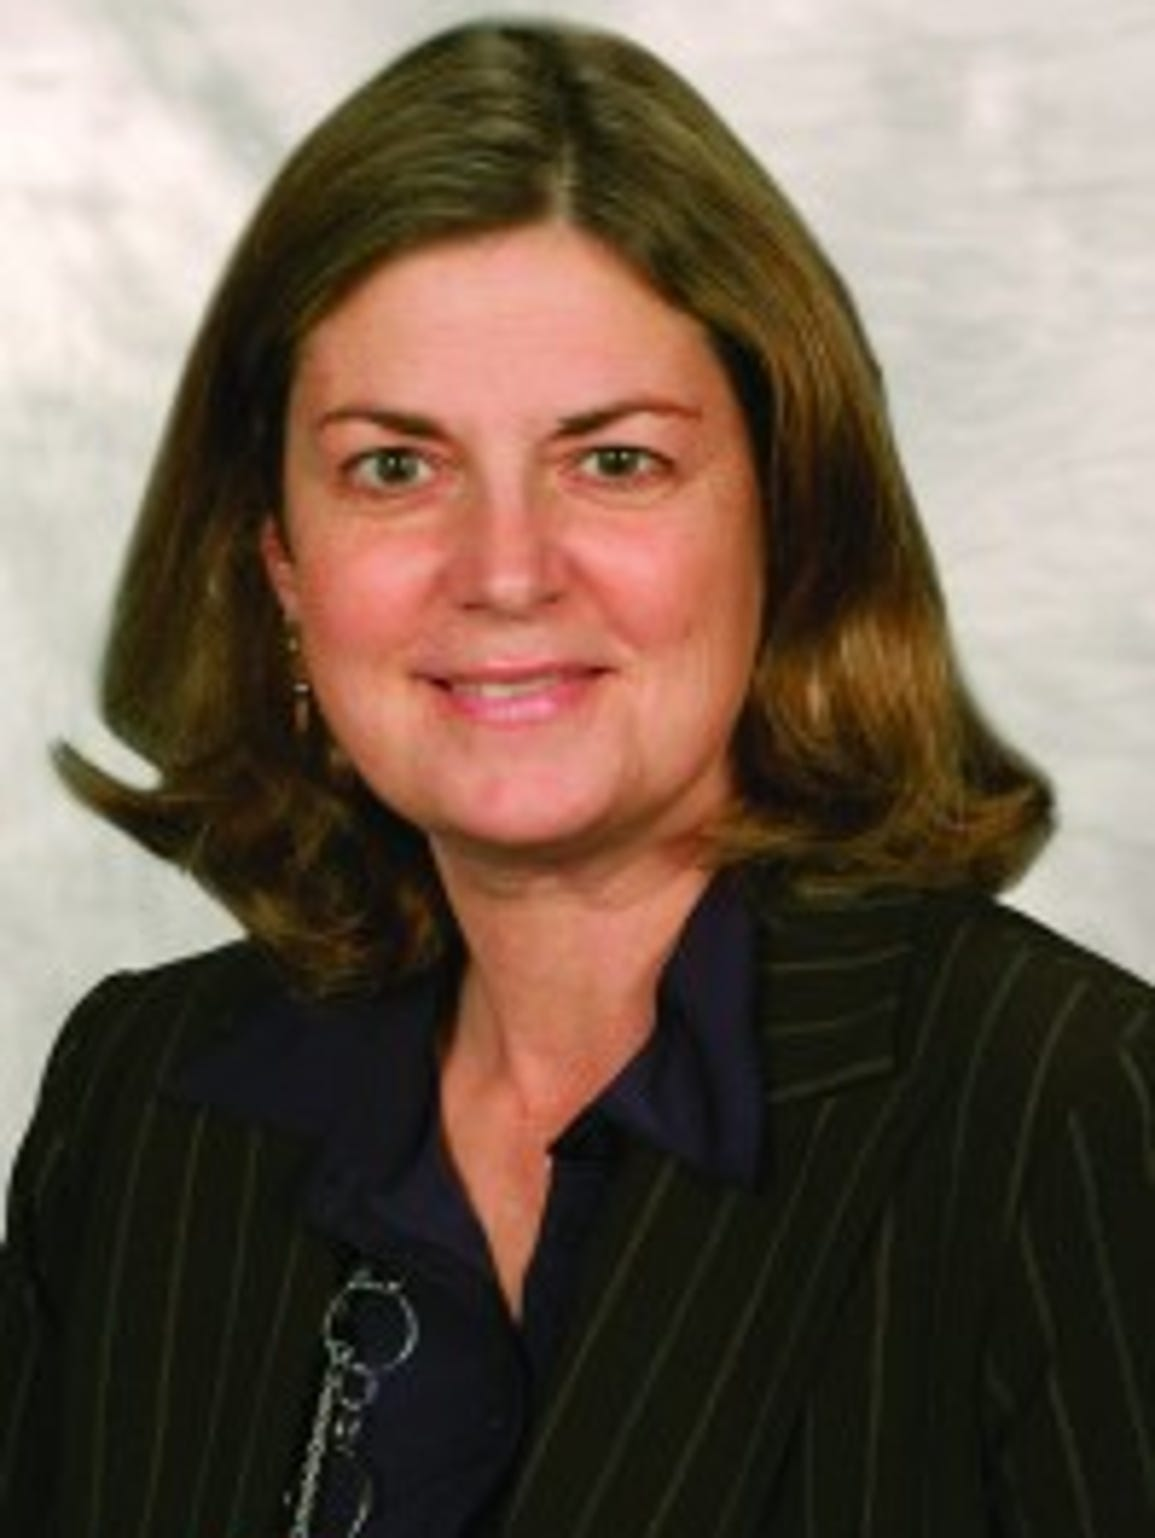 A. Kimberley Dayton, Minnesota law professor and guardianship